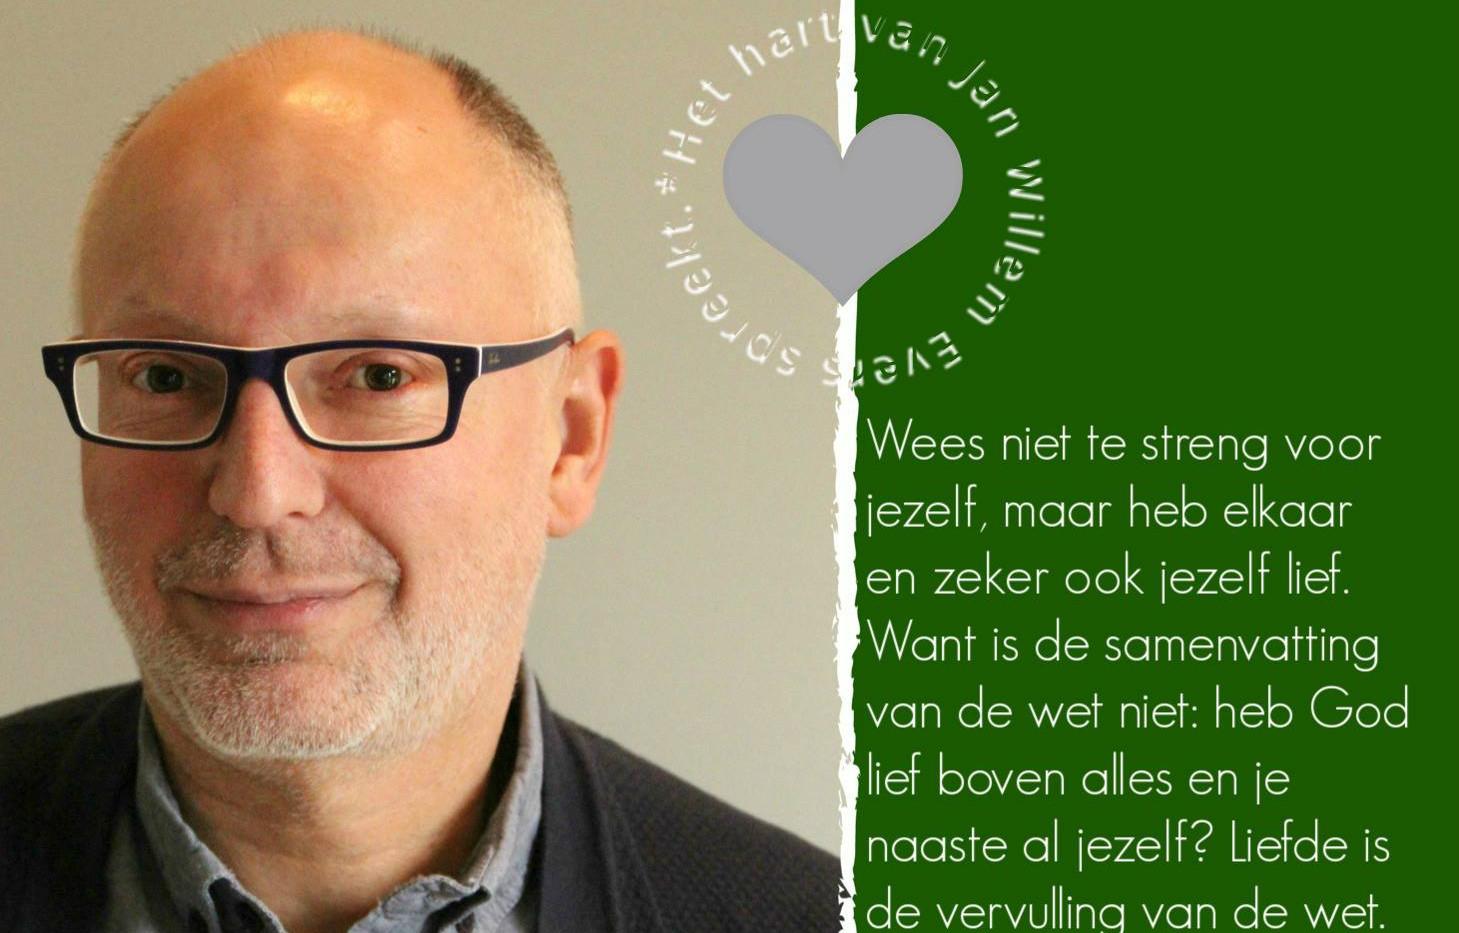 Jan Willem Evers